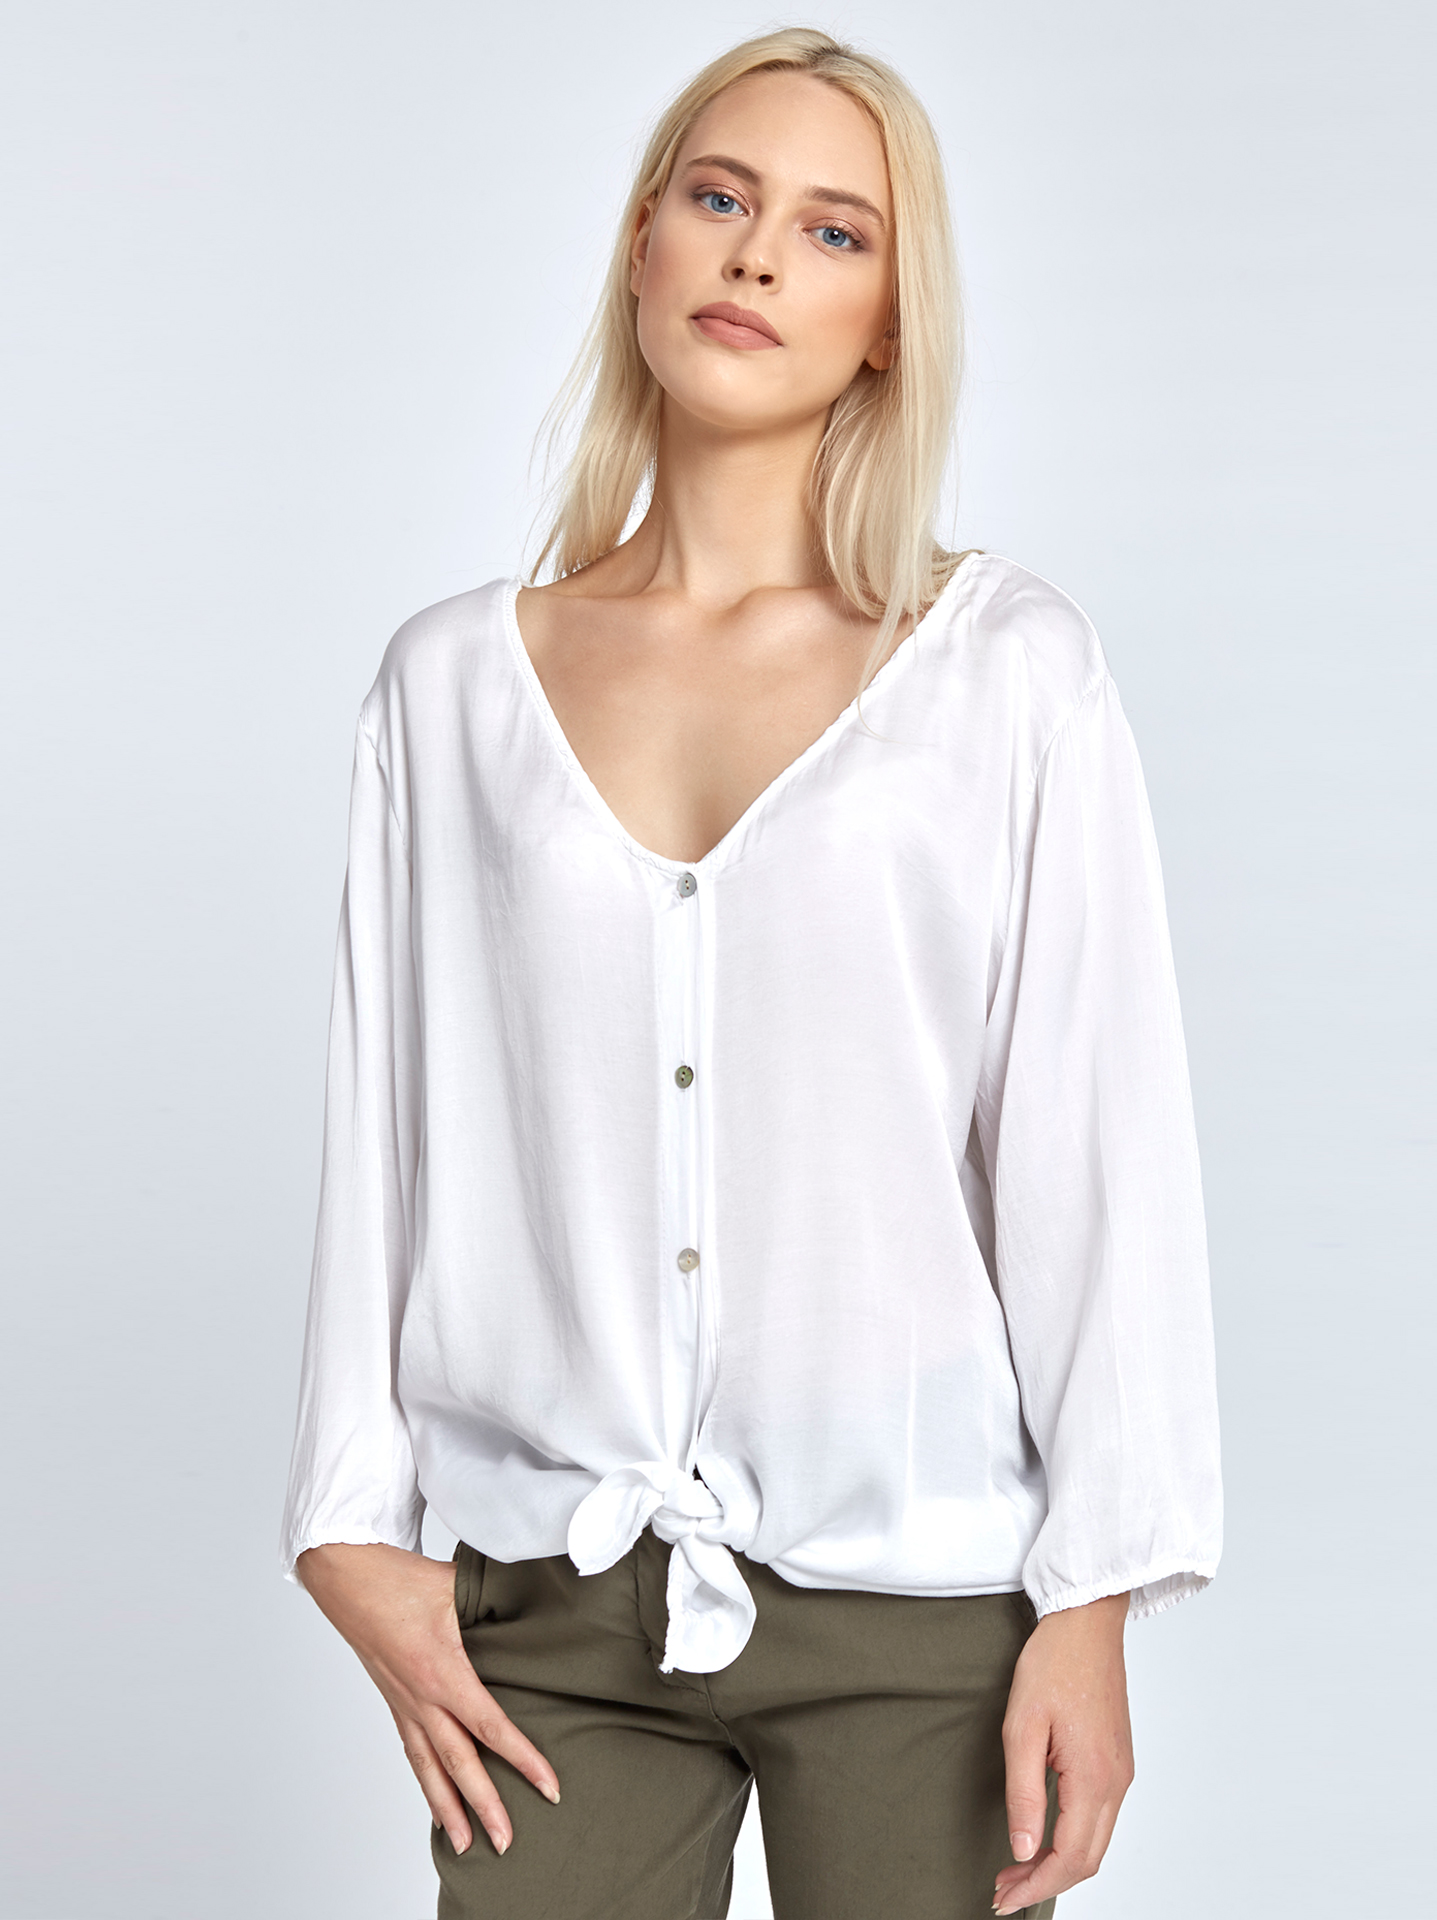 Satin-like tie front shirt white 5c4617c2c85